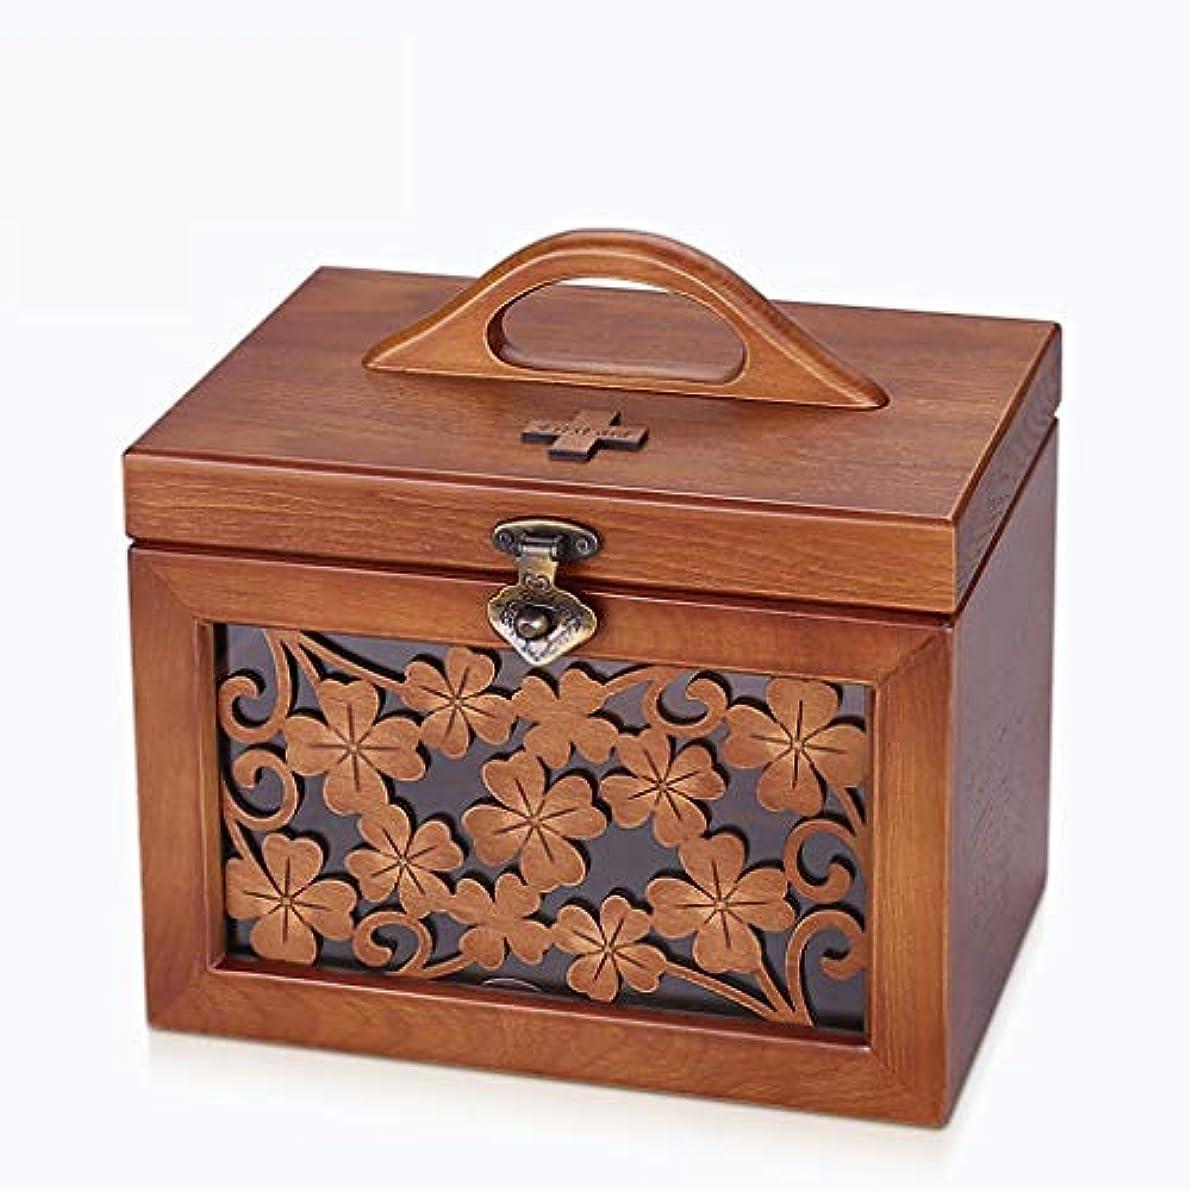 野球一致受取人木の薬品箱家の救急箱の医学箱家族の薬の収納箱 薬箱 (Size : 19cm×18cm×25cm)